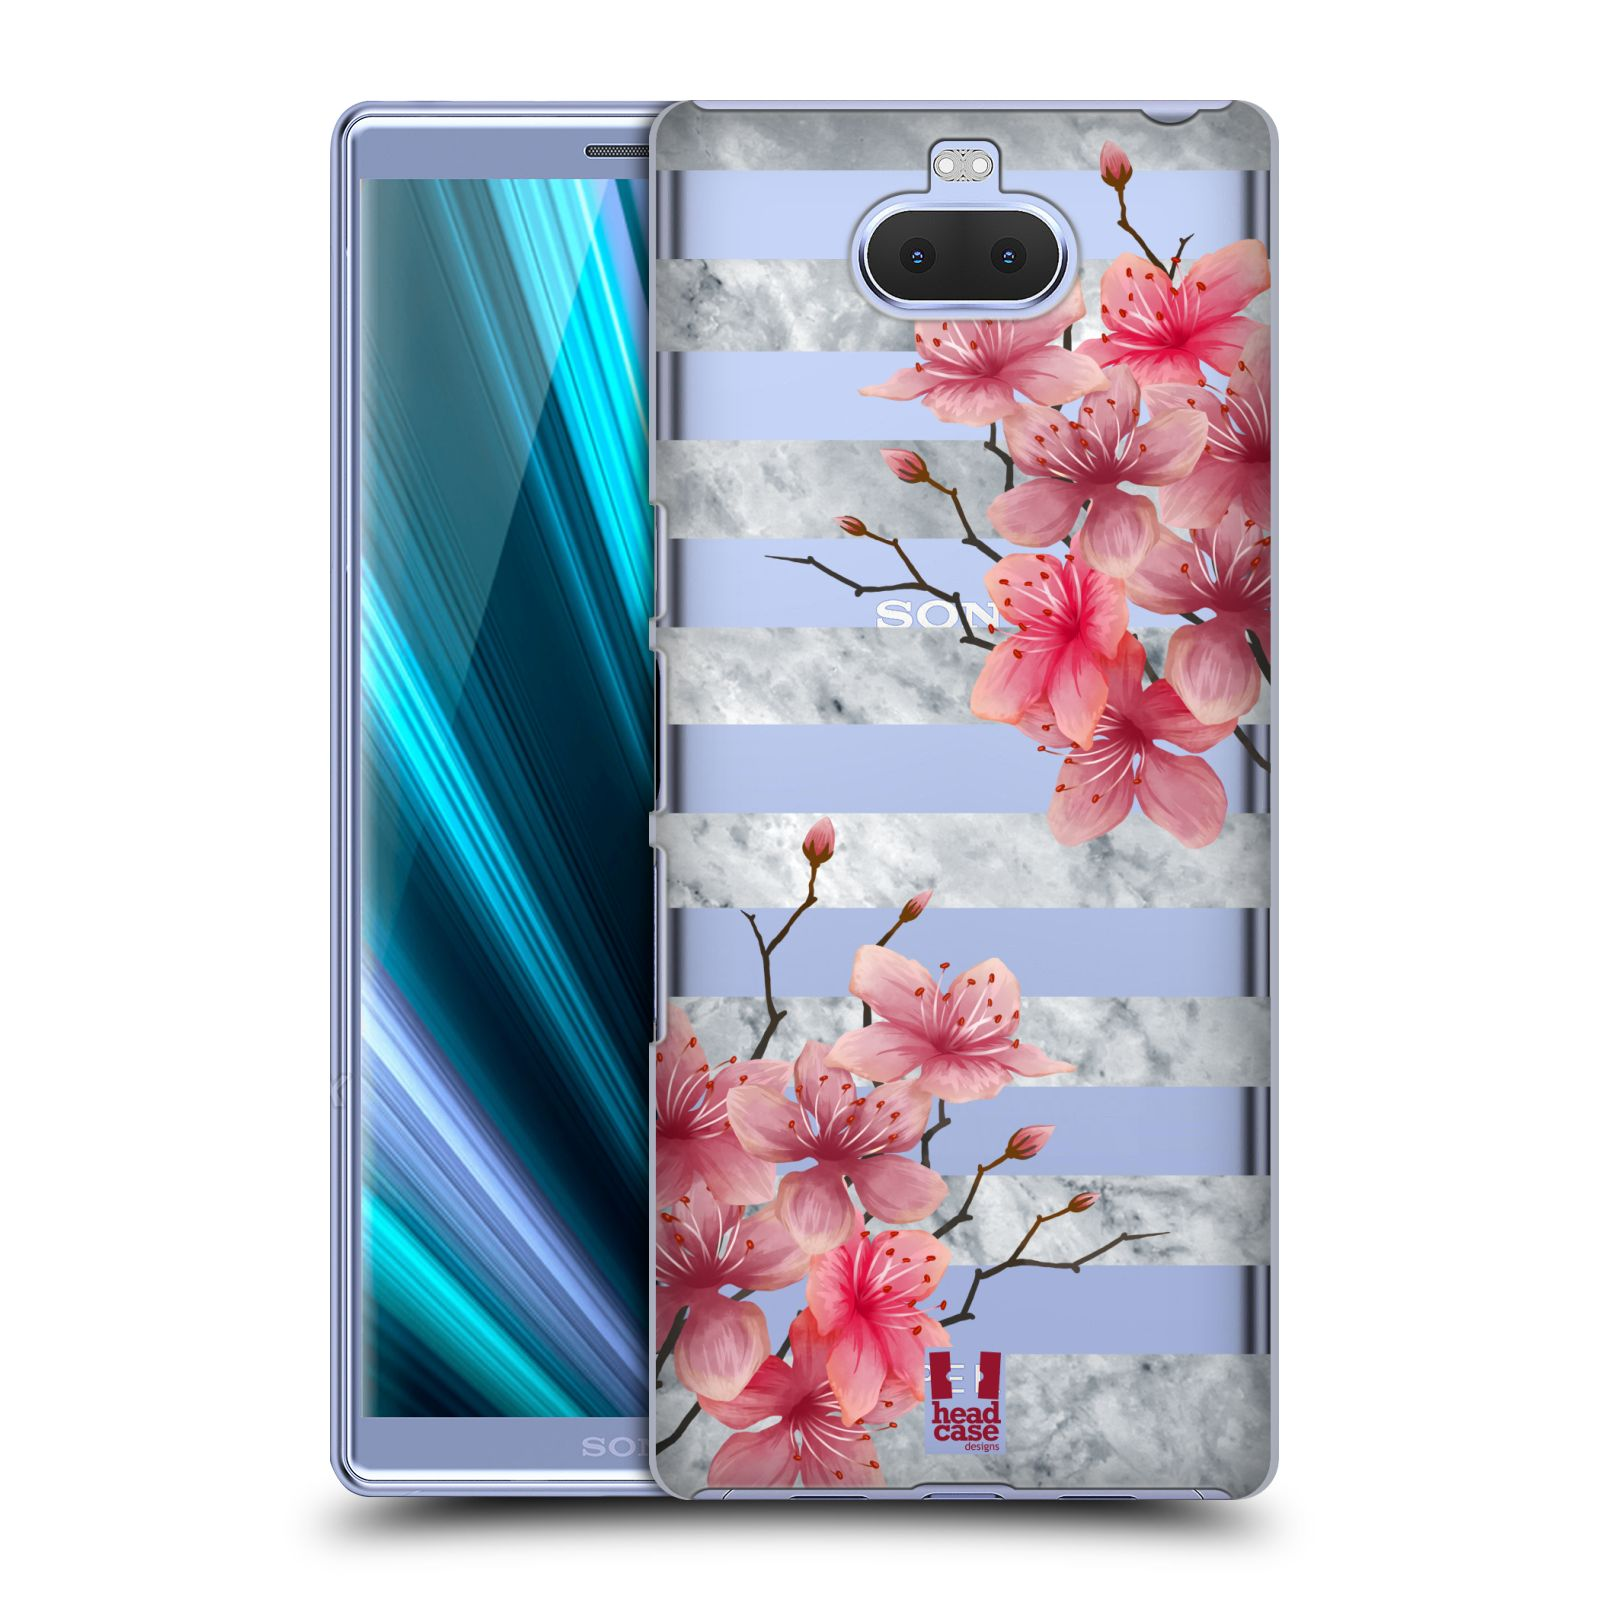 Pouzdro na mobil Sony Xperia 10 - Head Case - růžové květy v rozkvětu a mramor